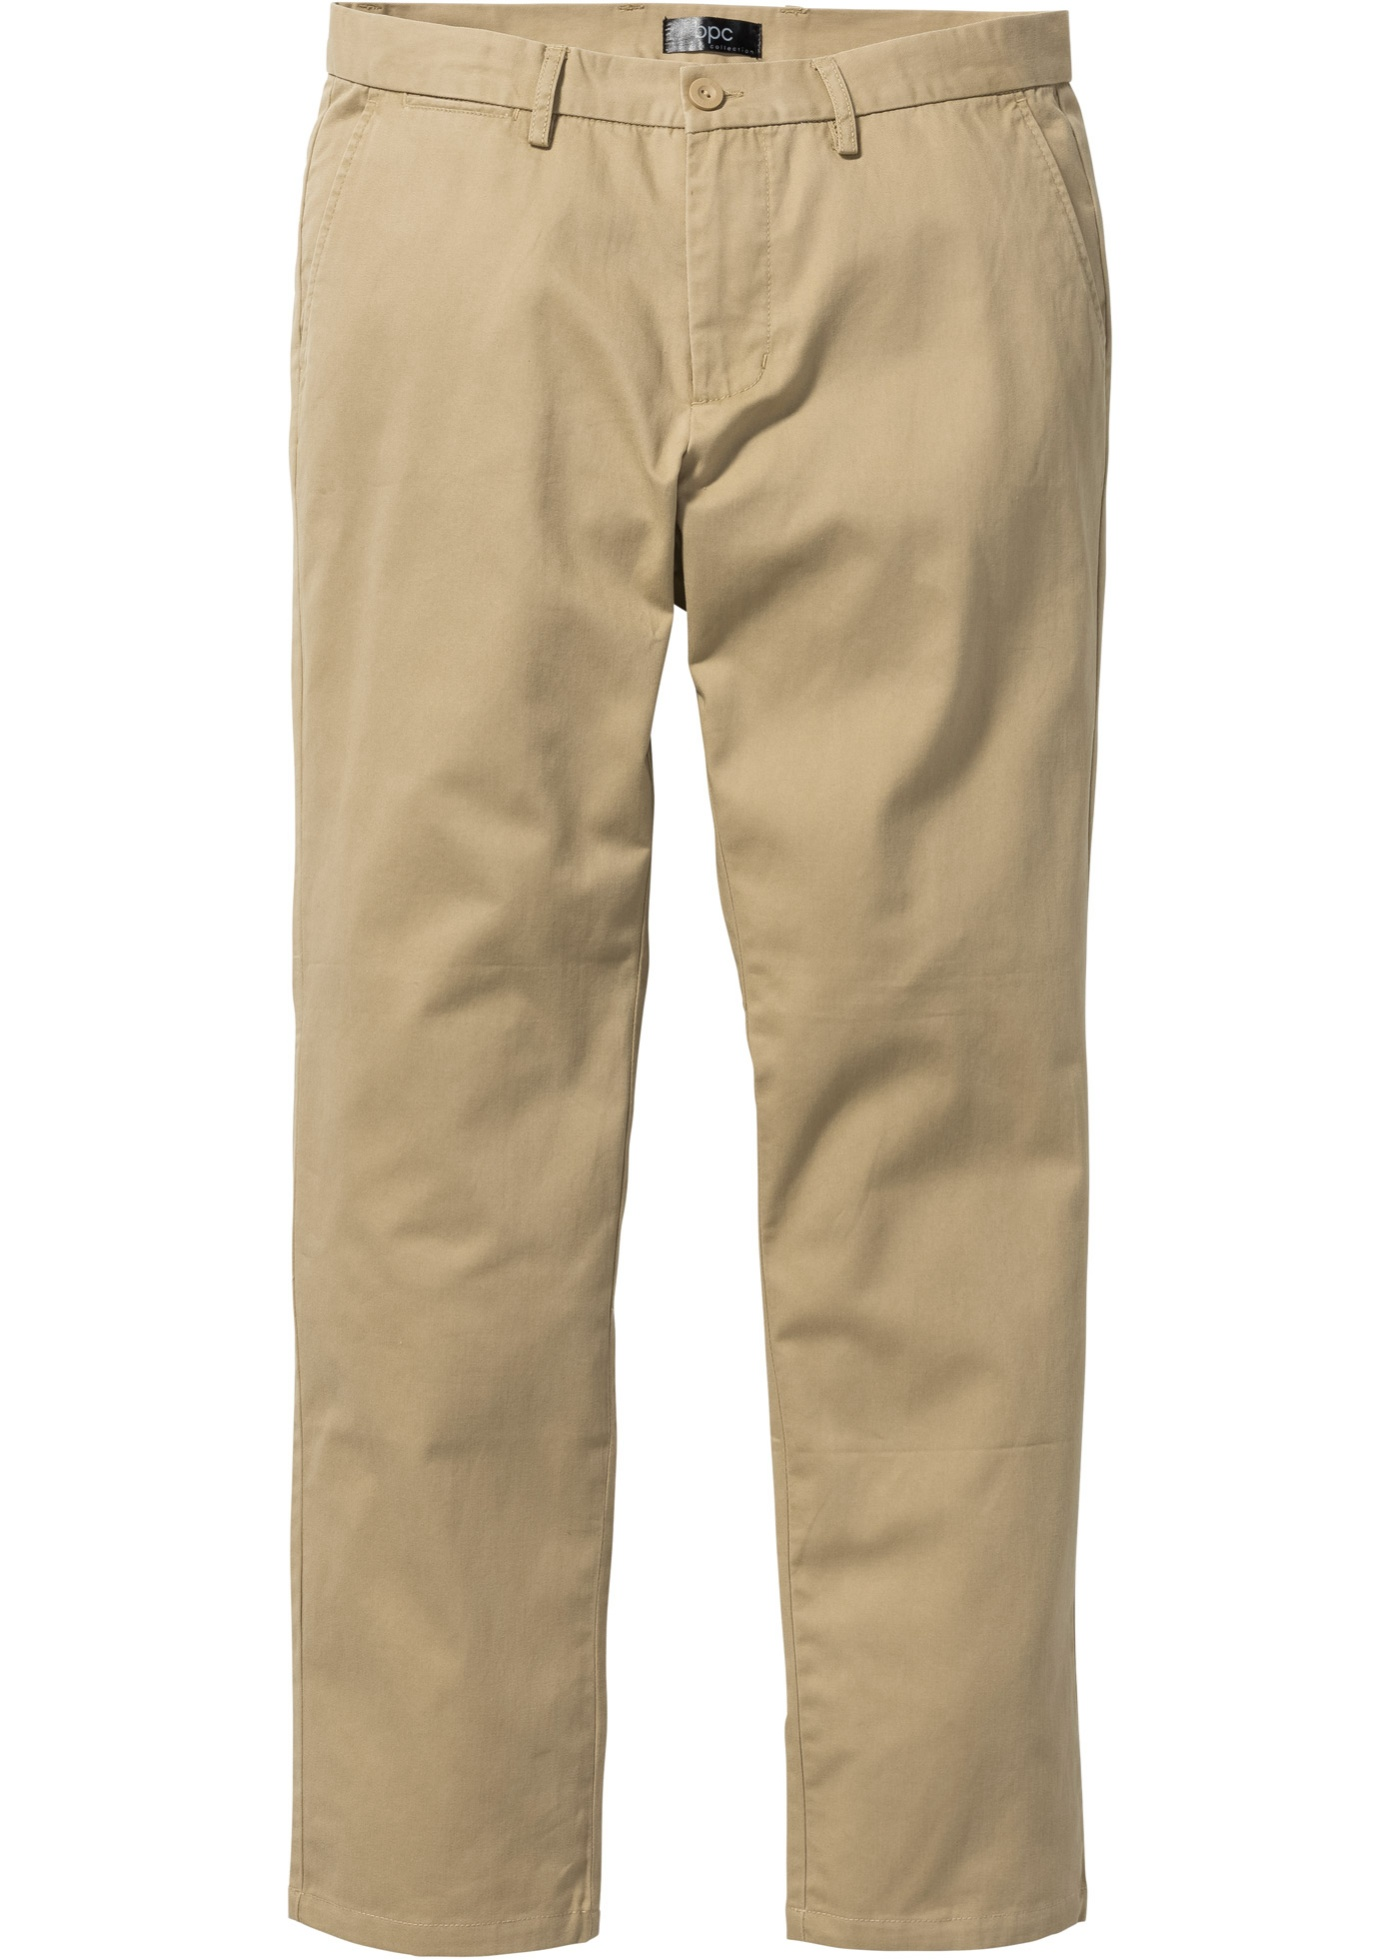 Pantalone chino regular f